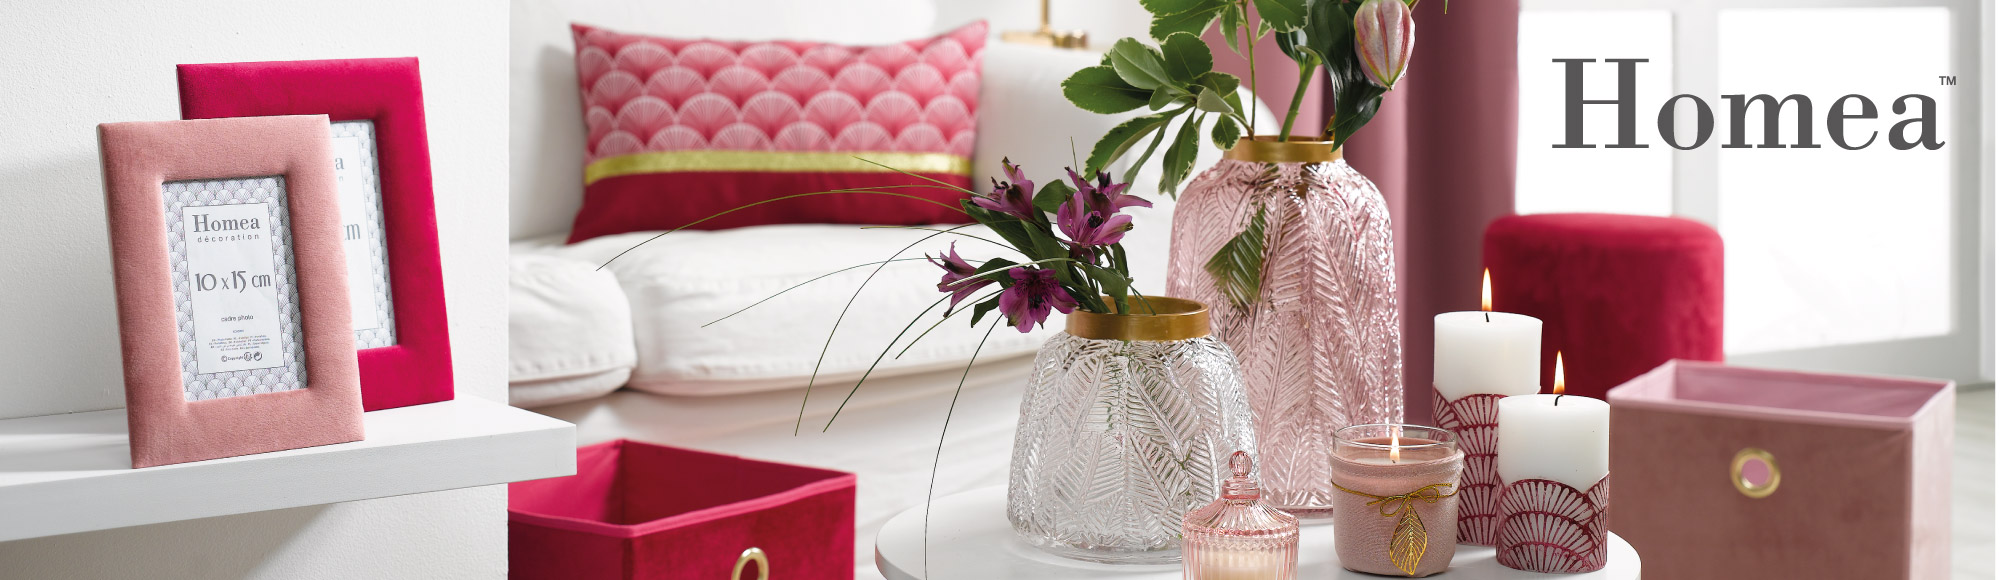 U10 - Homea - Decoration - Collection - Boudoir Gold